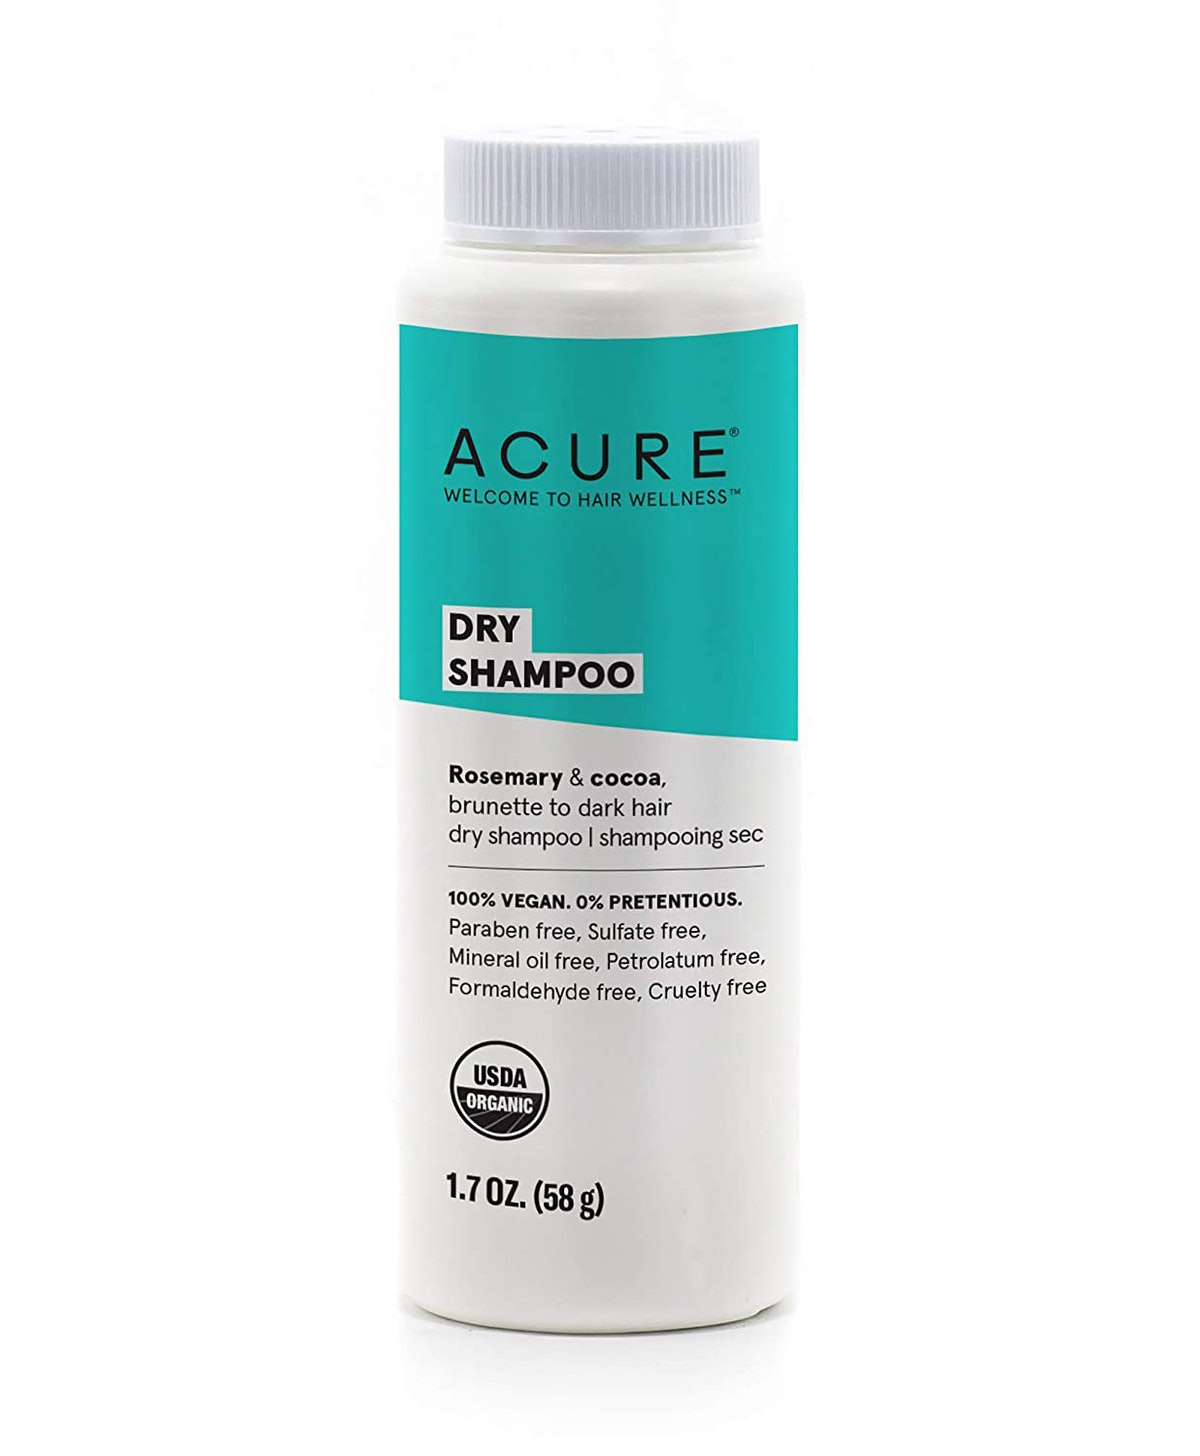 ACURE Dry Shampoo - Brunette To Dark Hair